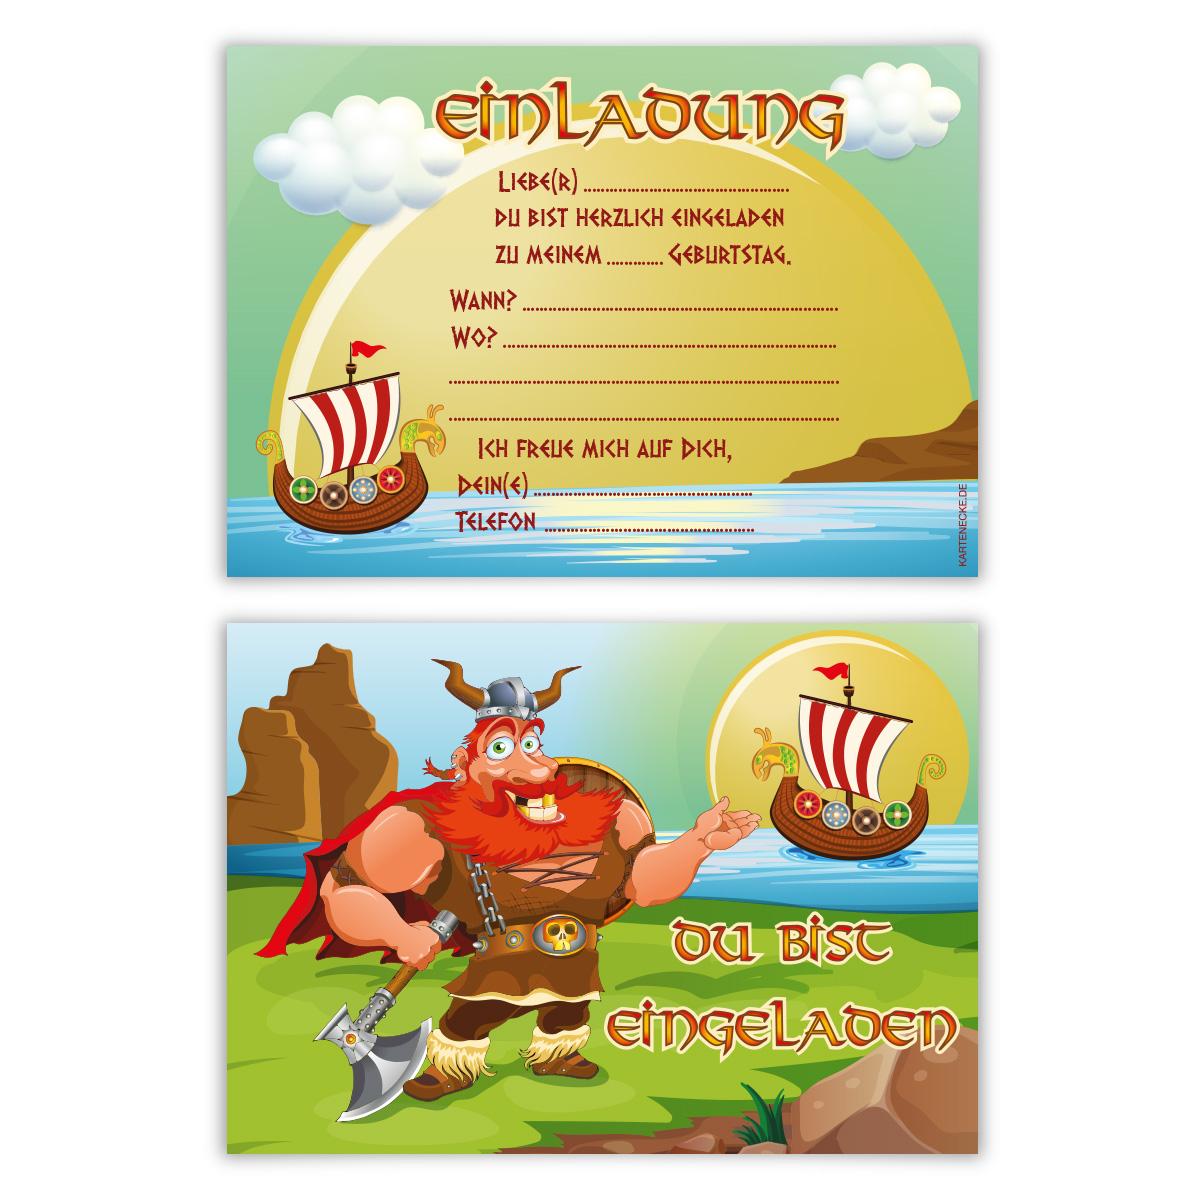 einladungskarten (8 stück) zum selbst ausfüllen kinder